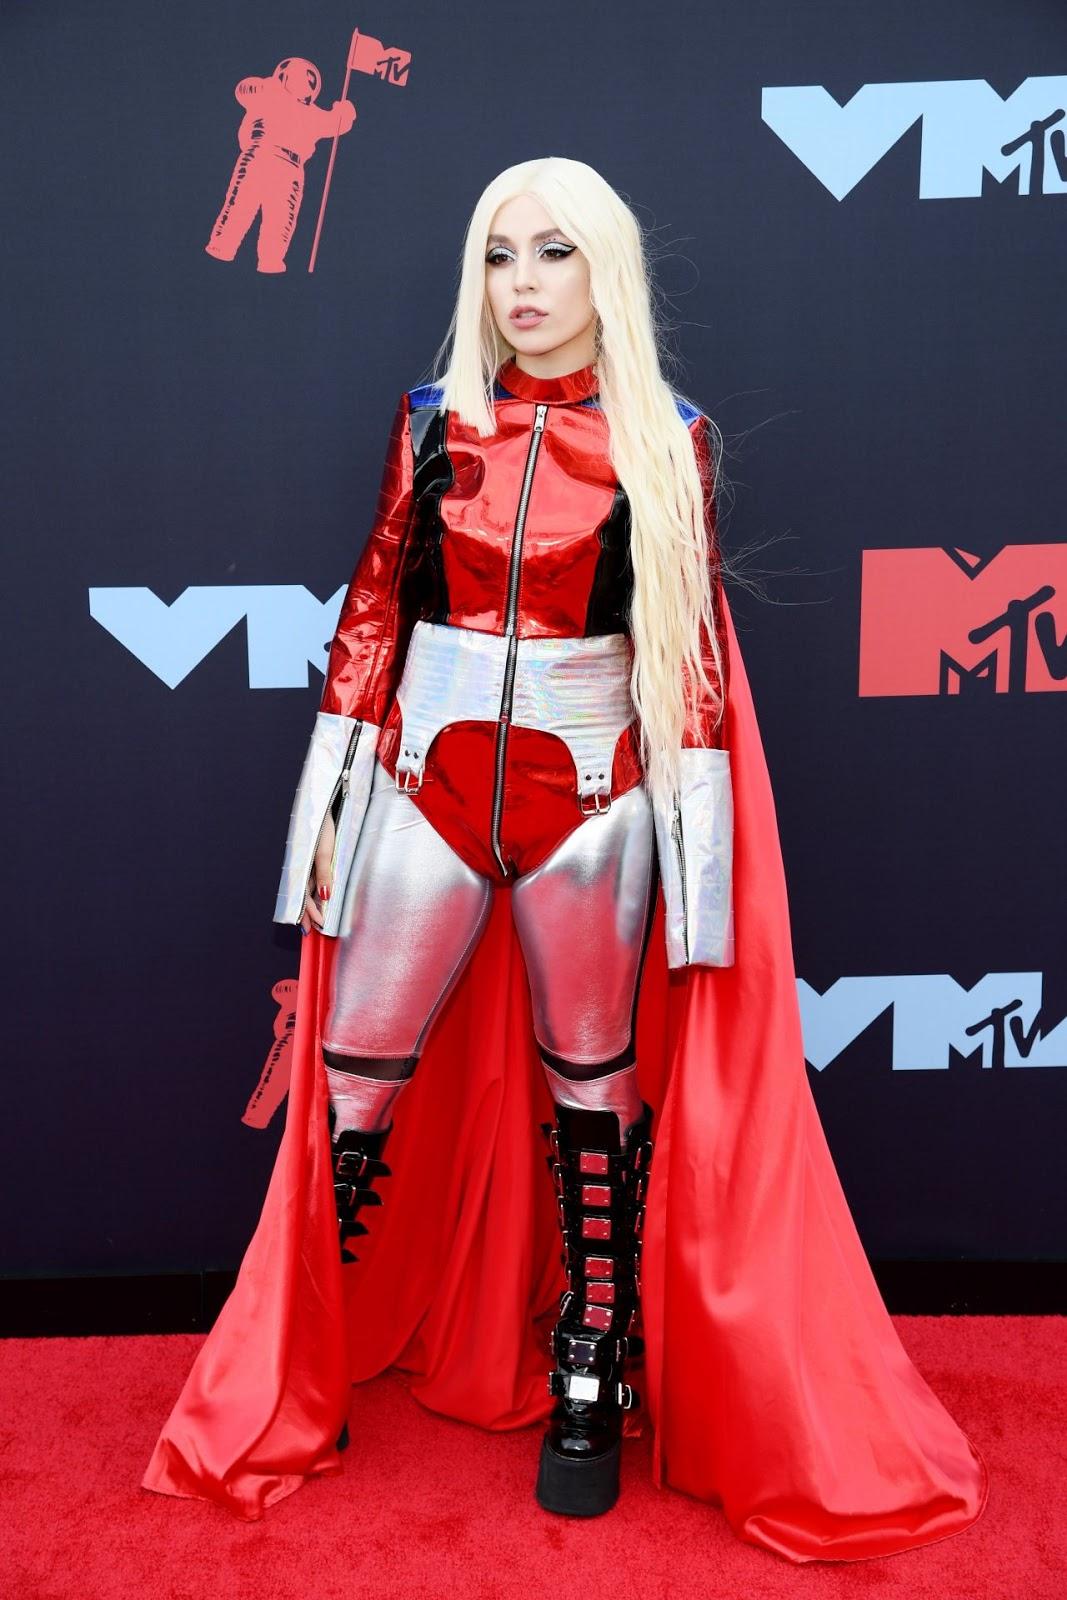 Ava Max turns superhero for the 2019 MTV VMAs